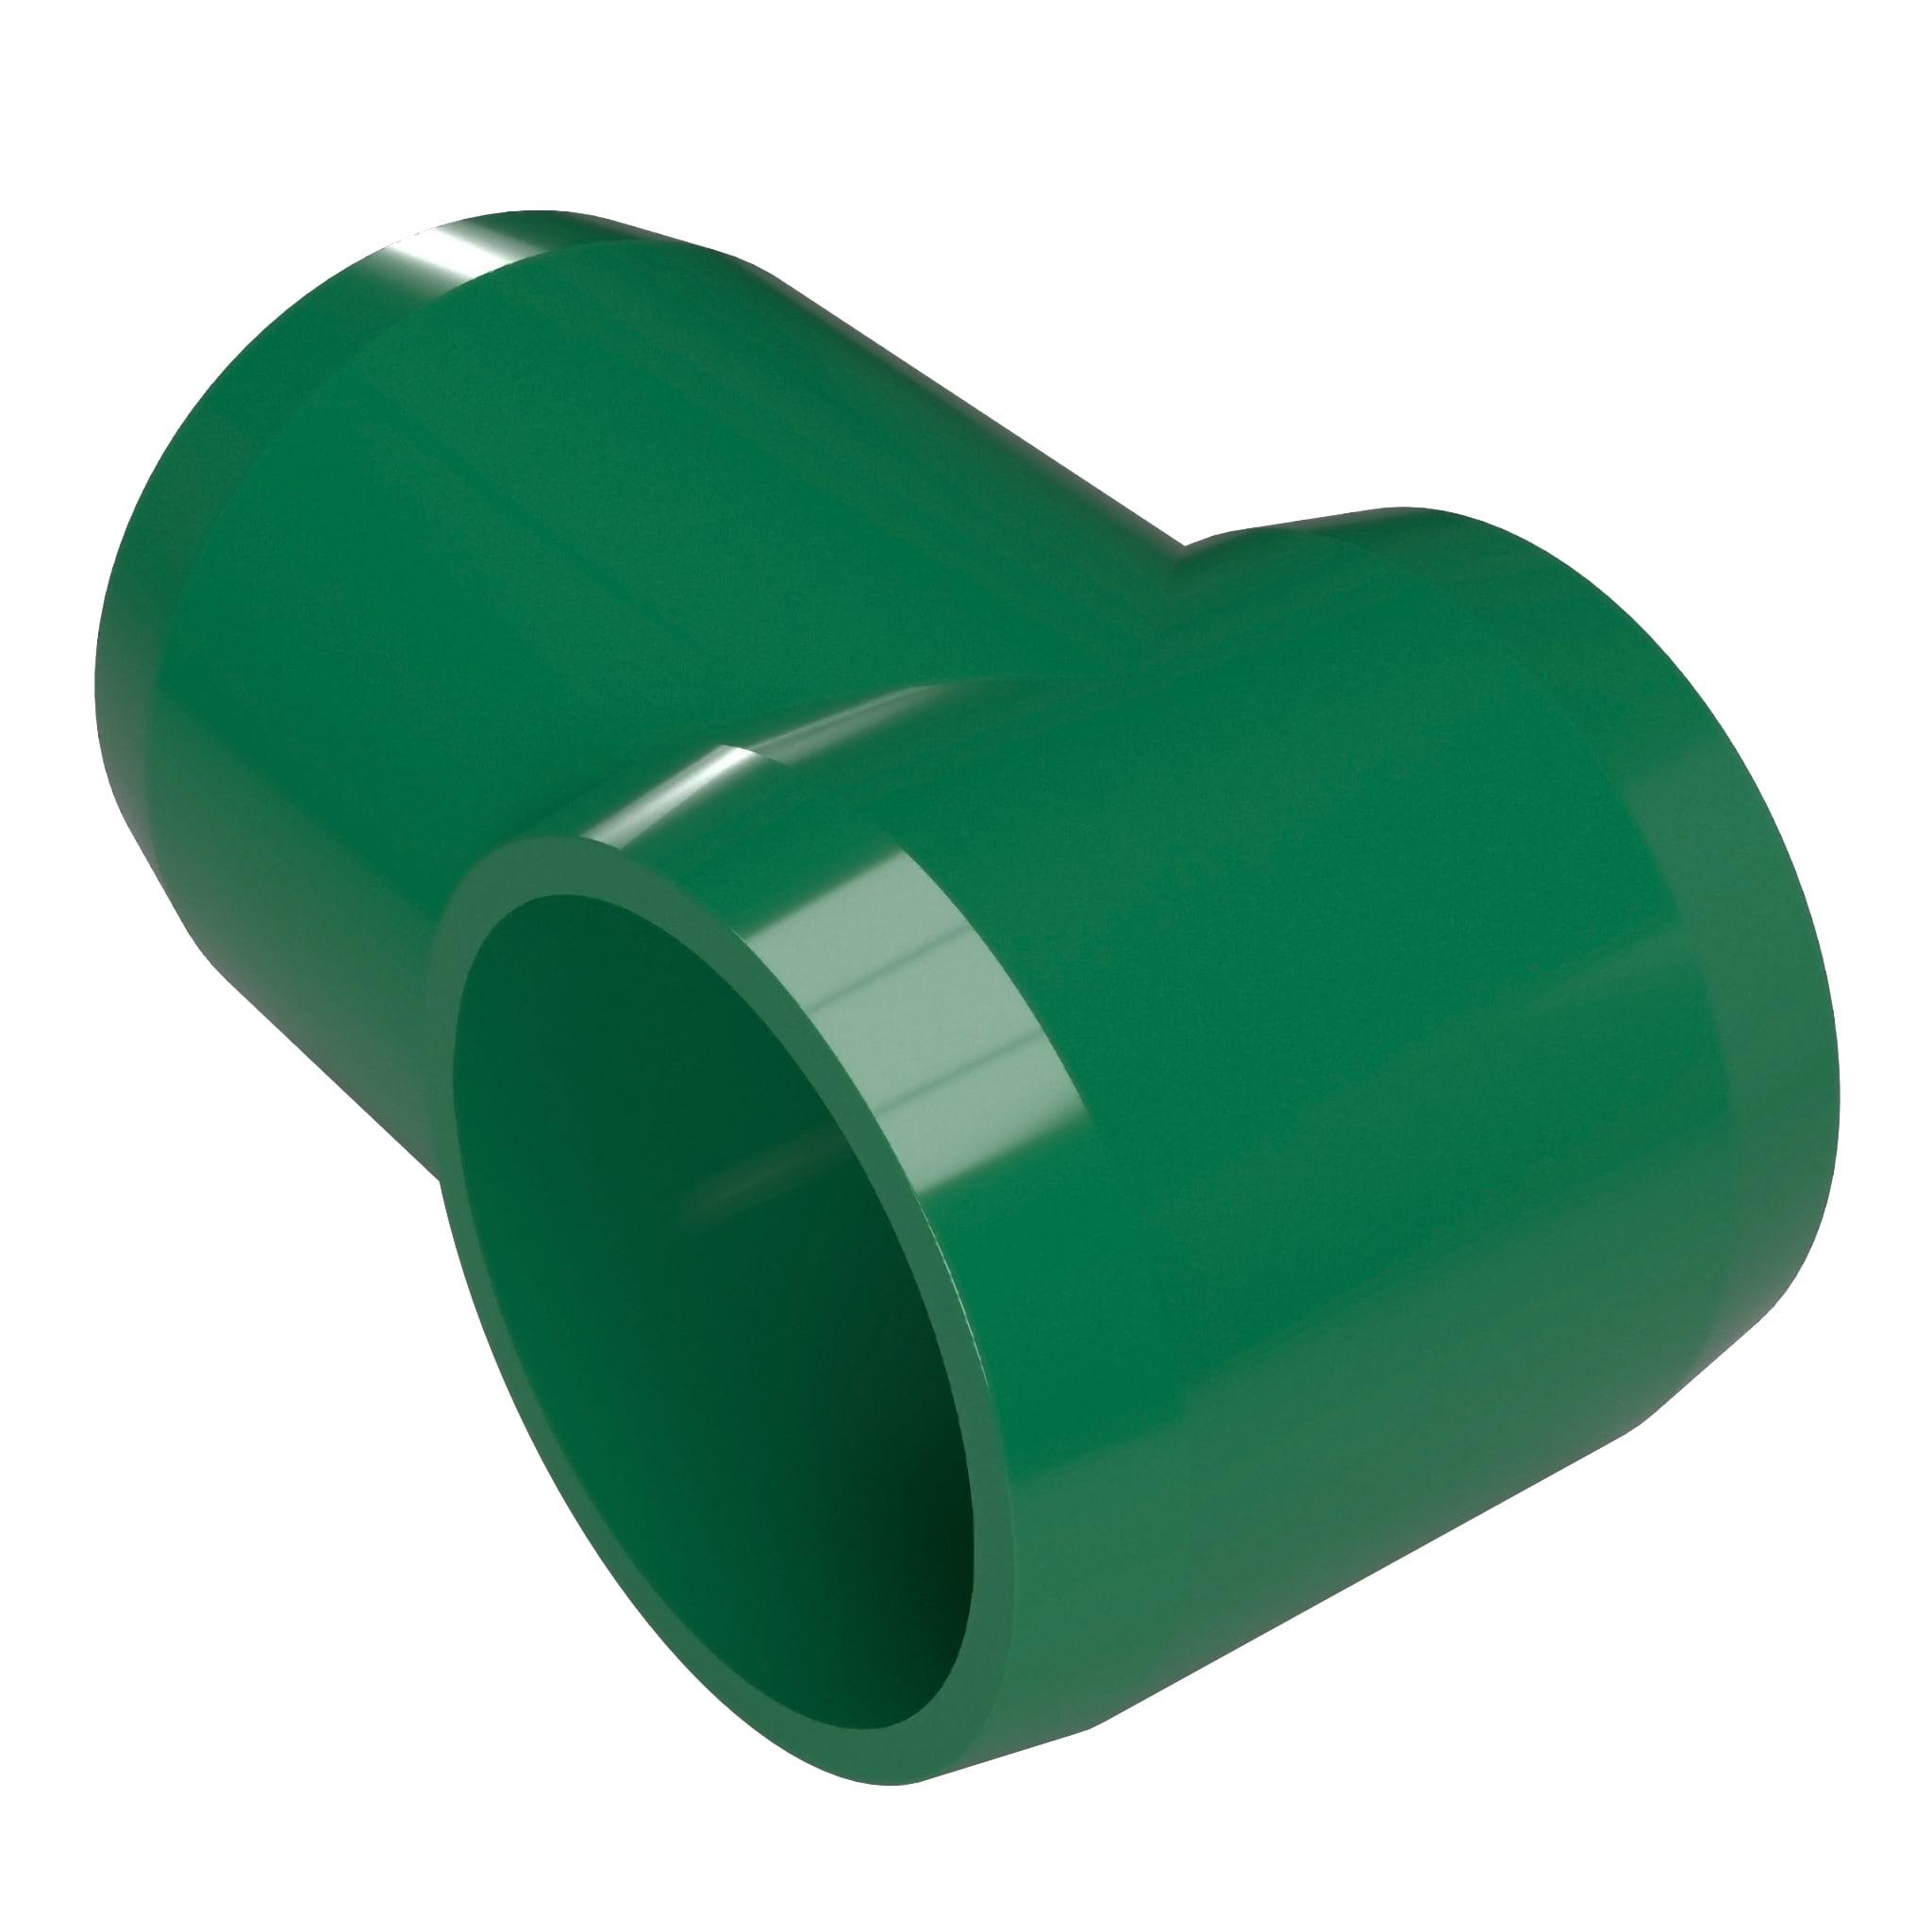 FORMUFIT F114STE-GR-4 Slip Tee PVC Fitting, Furniture Grade, 1-1/4 in. Size, Green , 4-Pack